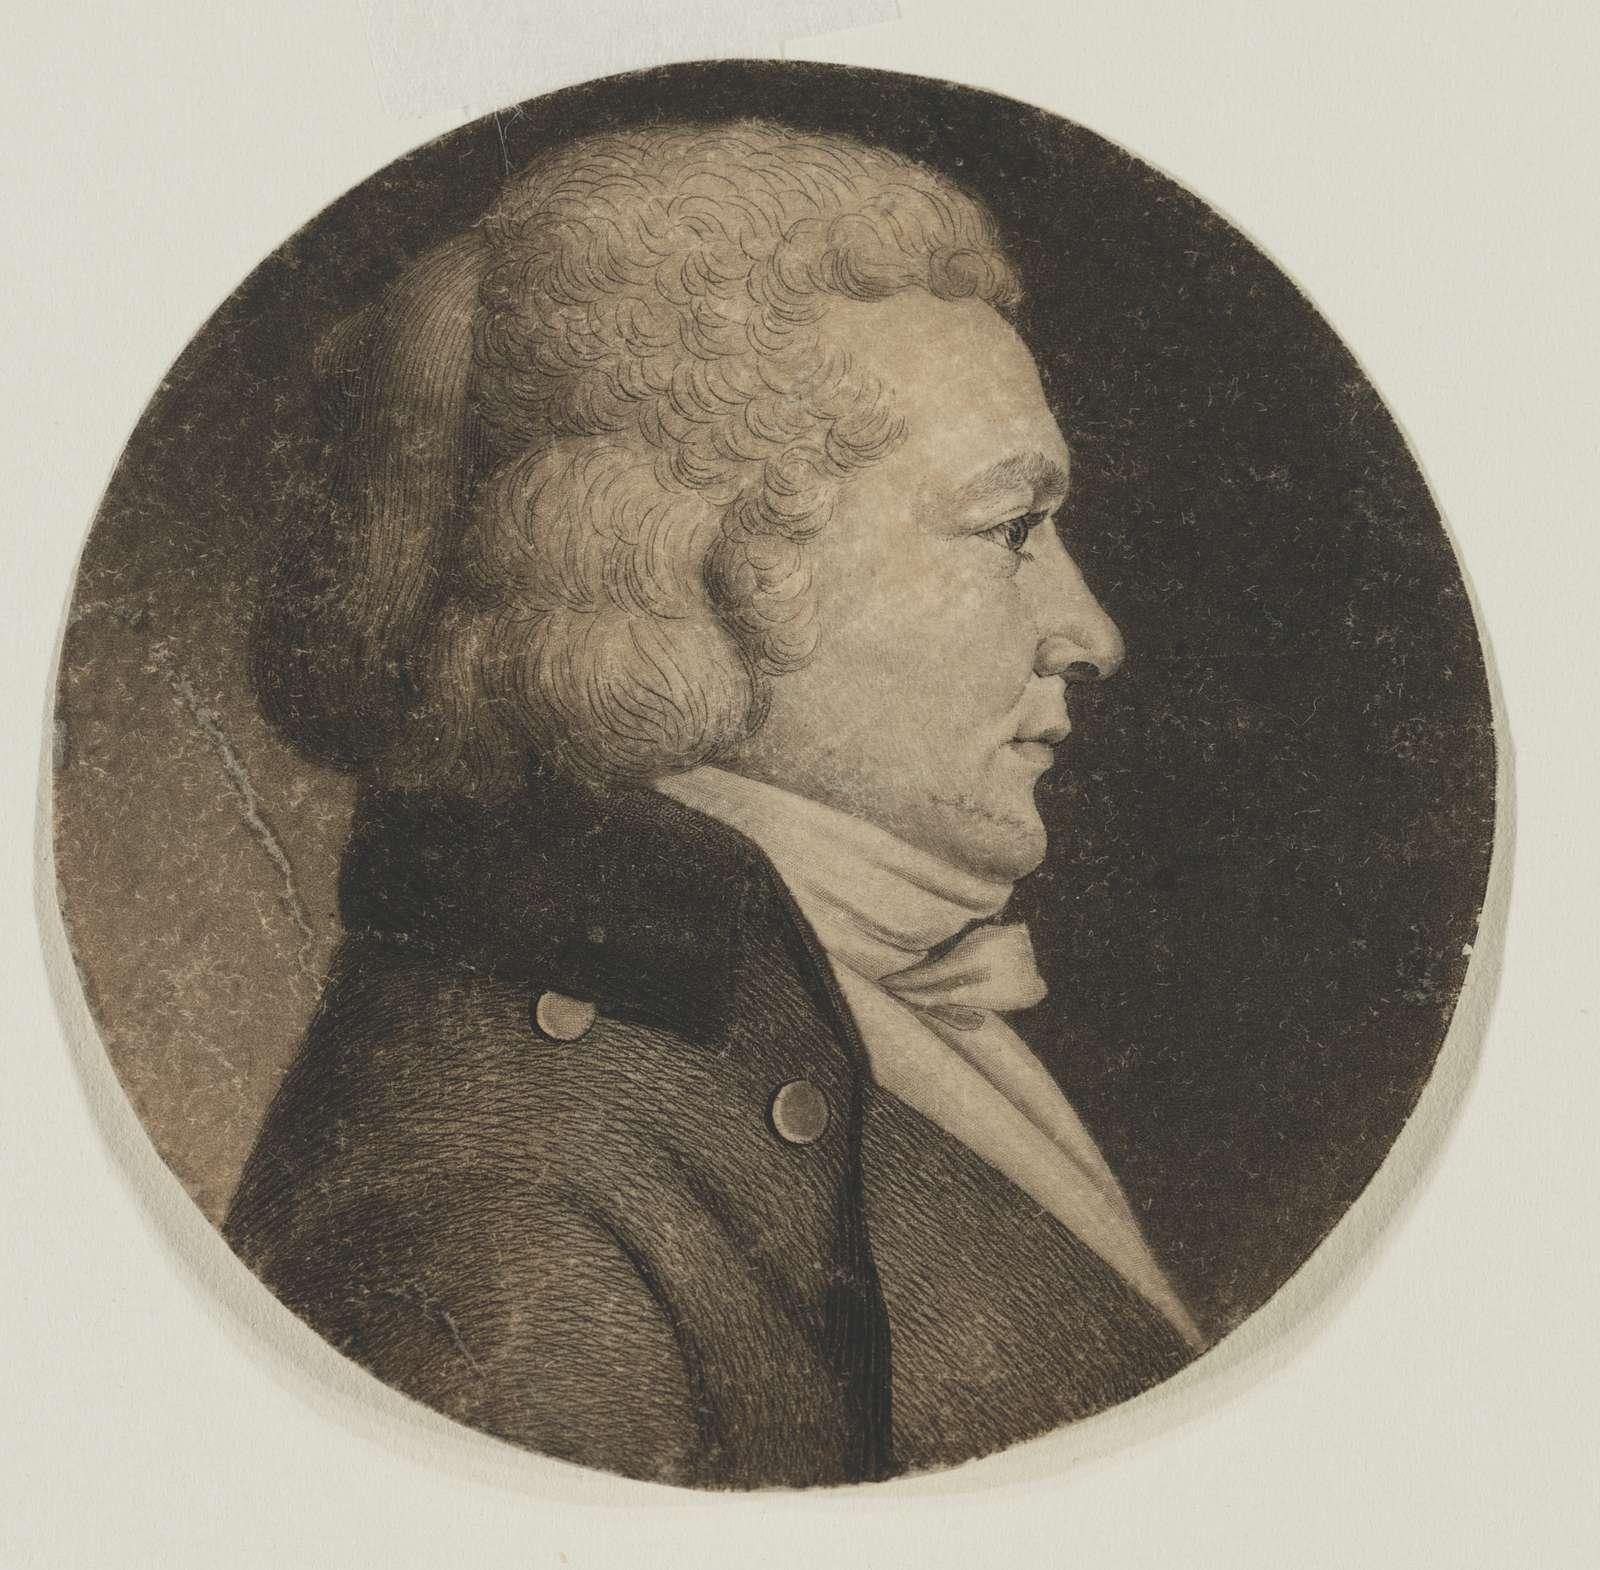 Thomas Truxtun, head-and-shoulders portrait, right profile